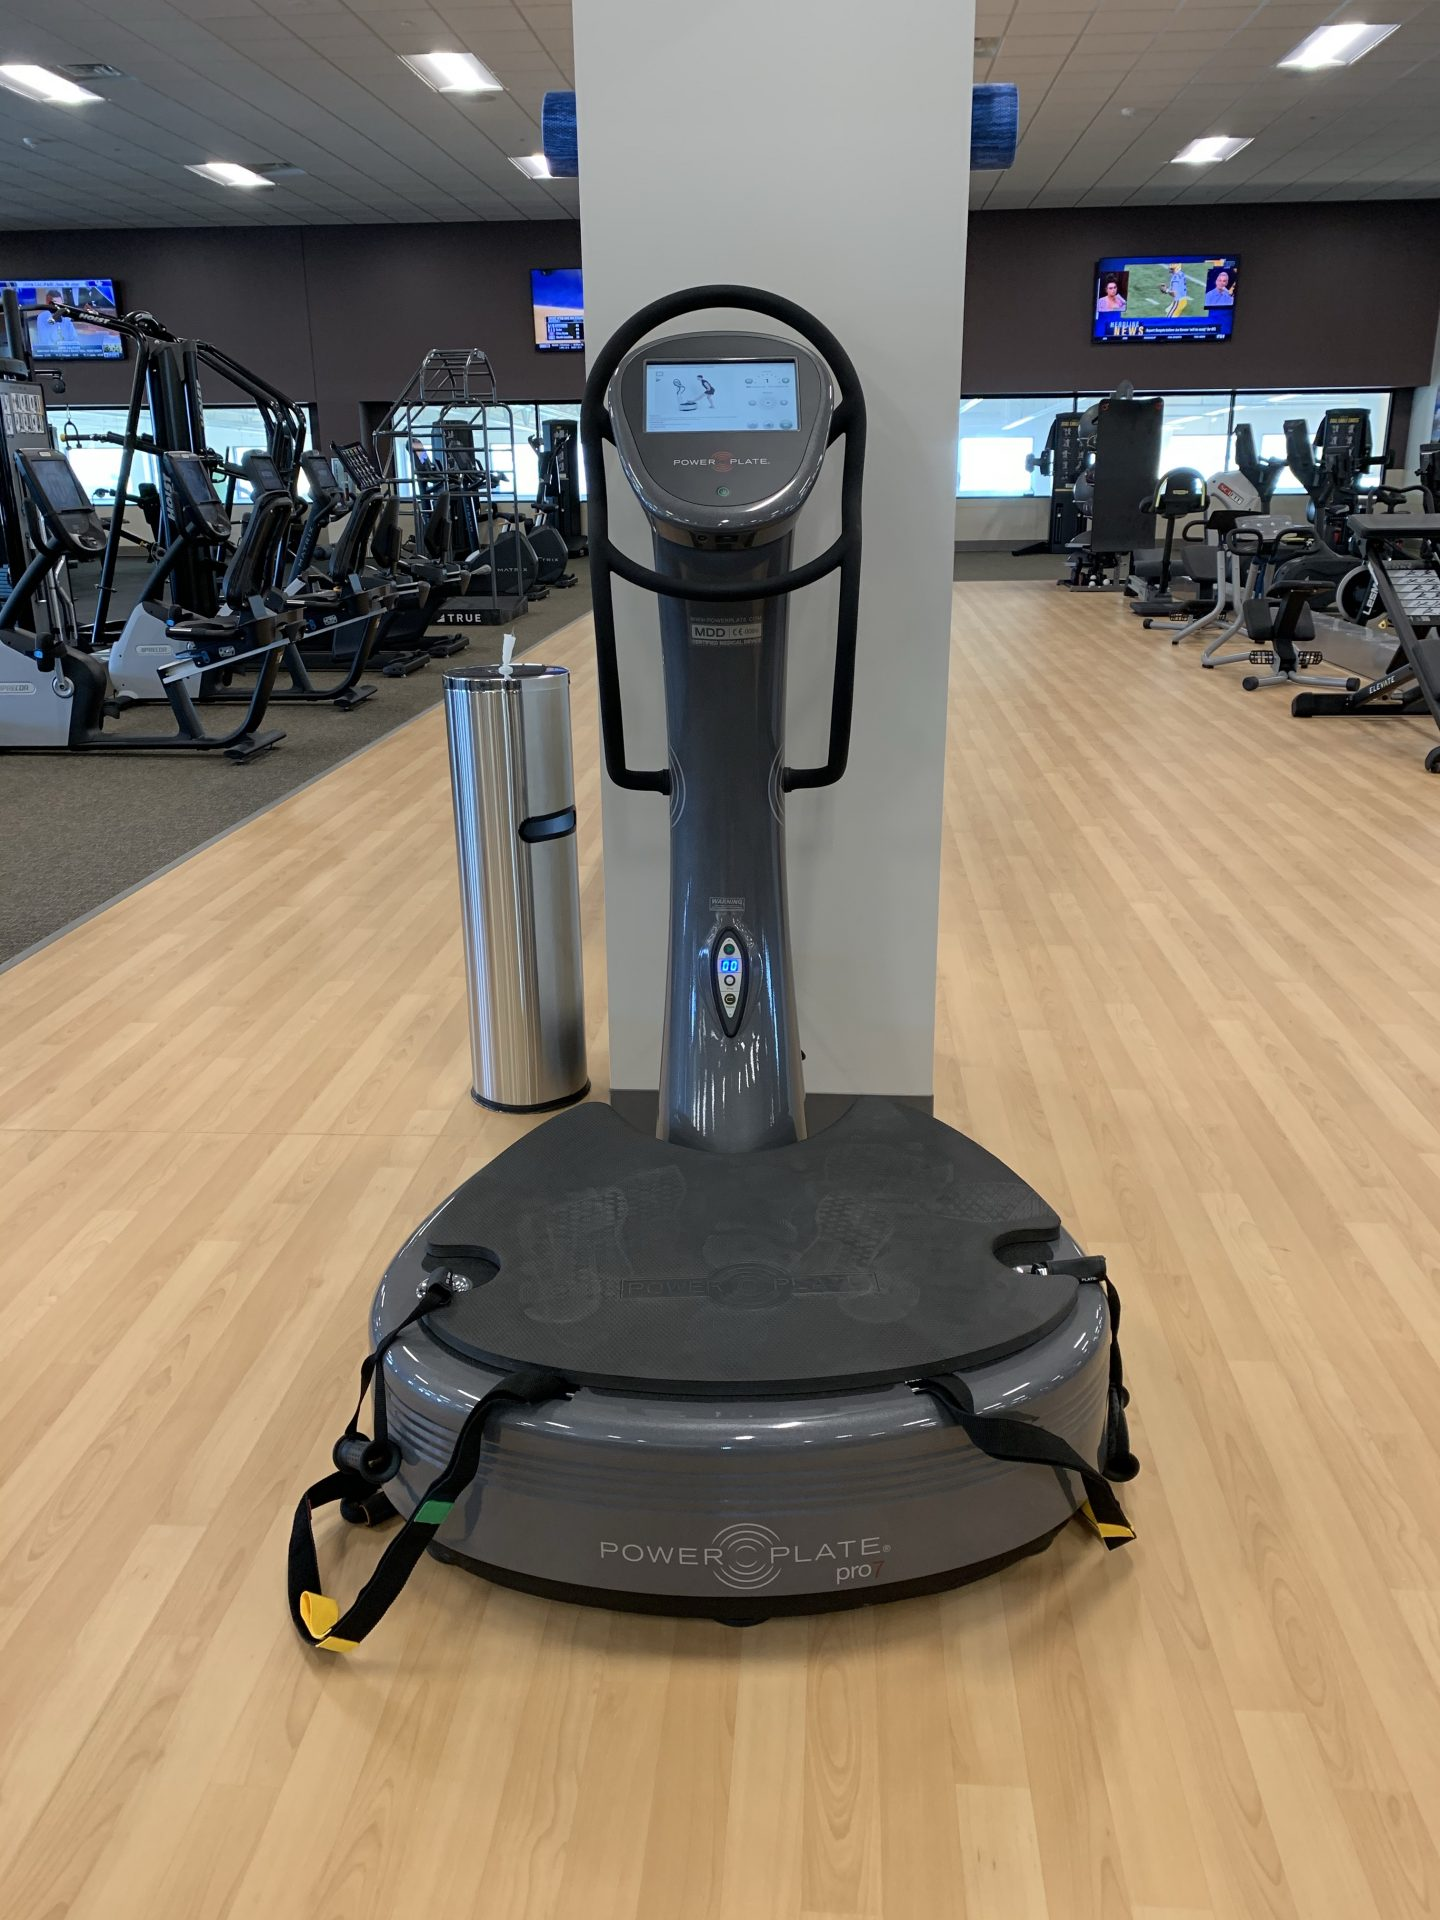 power plate machine - gyms in katy tx - villa sport cinco ranch